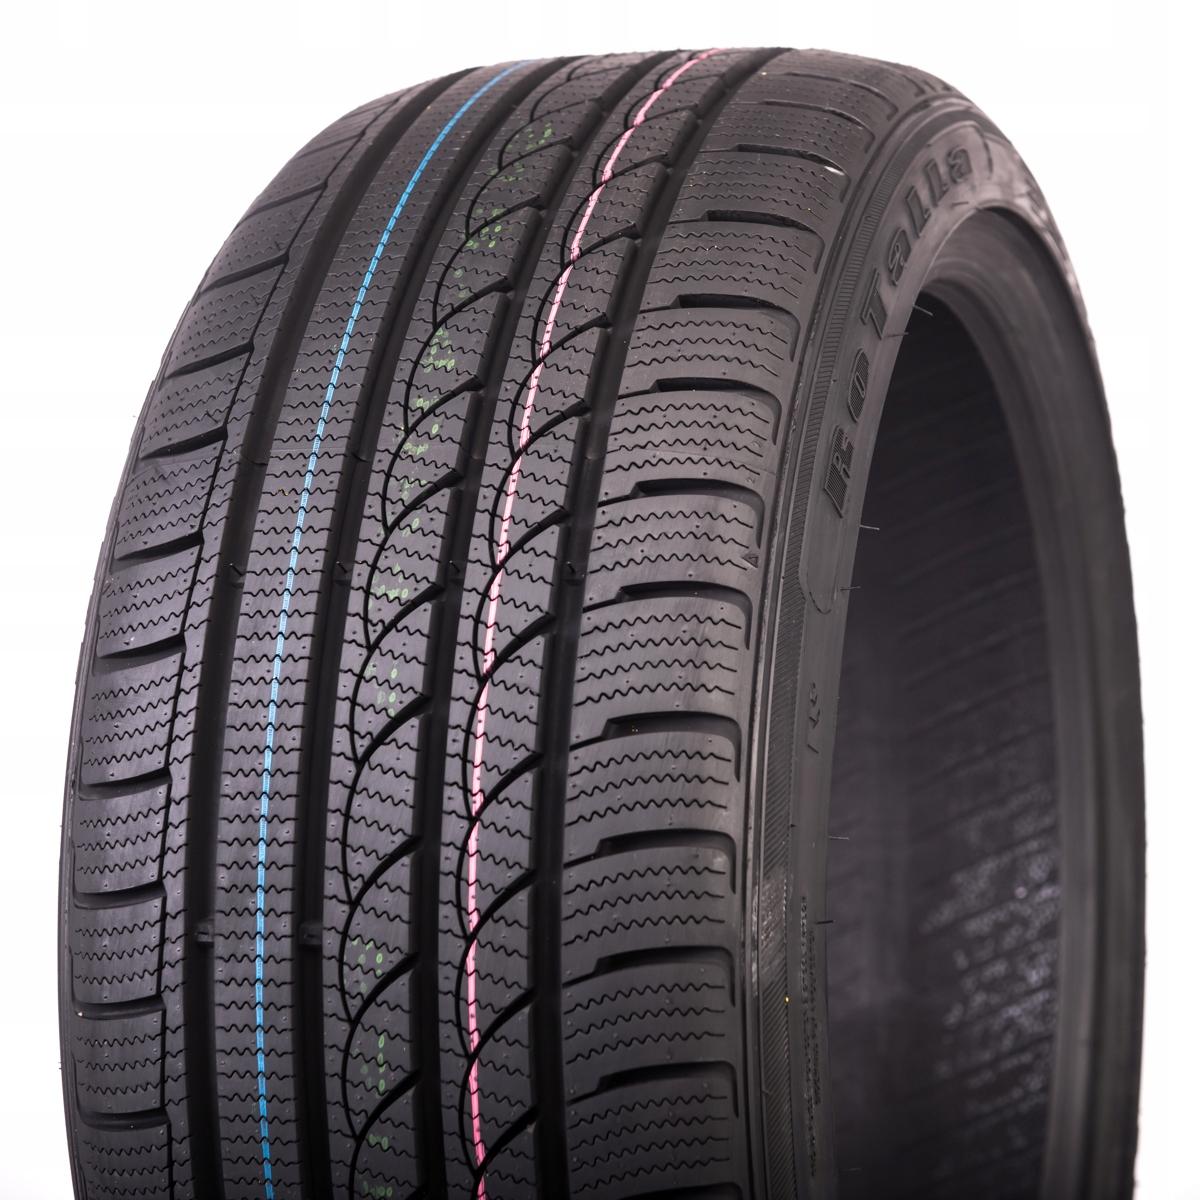 Neumático ROTALLA WT S210 175/60R15 81 H